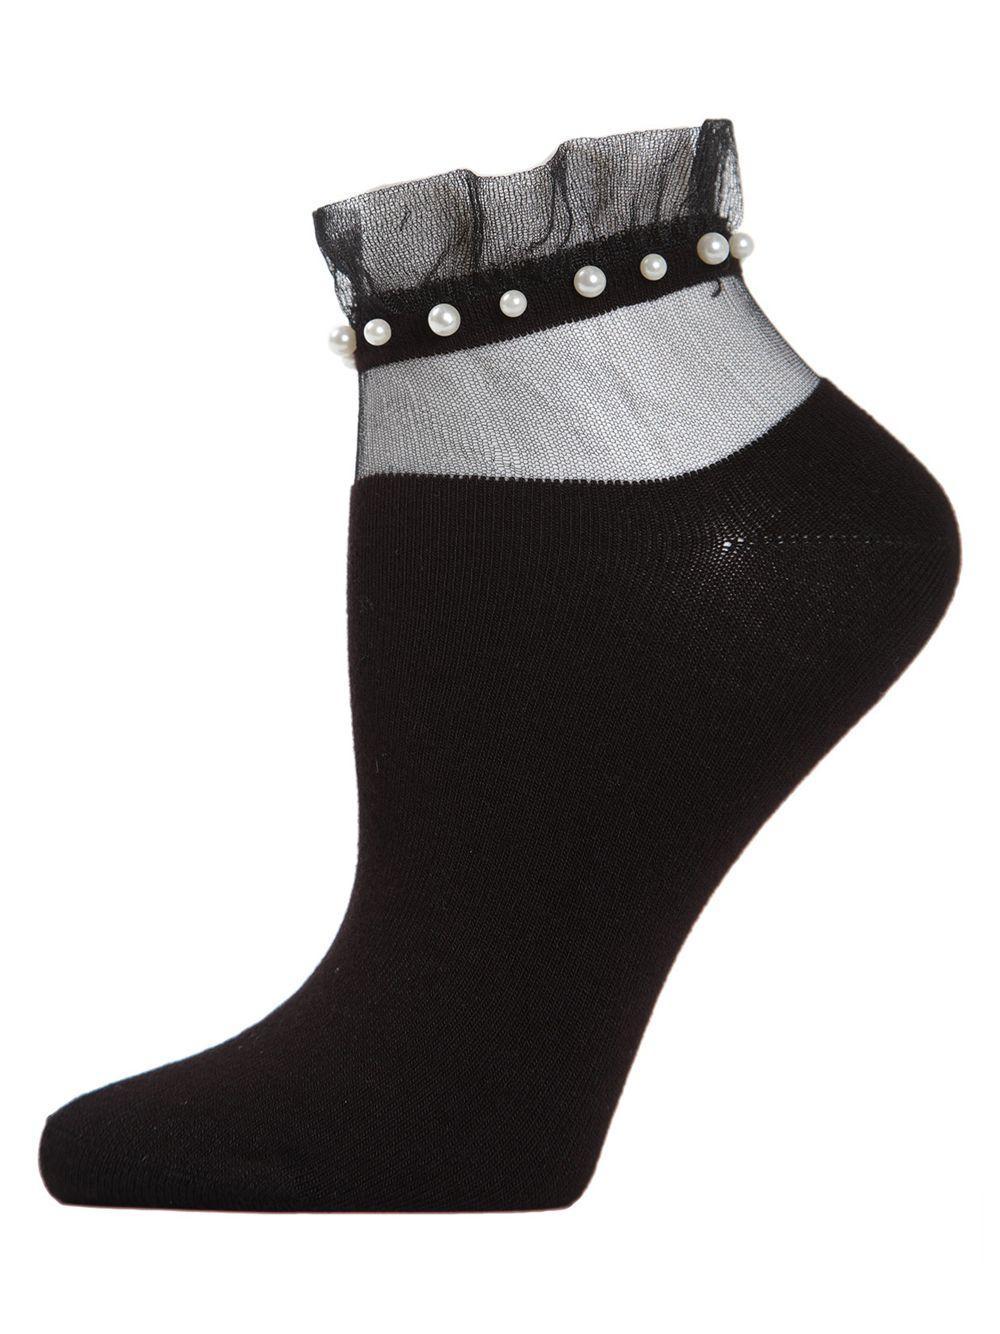 6d3bfd0879d Lyst - Memoi Sheer Ruffle-cuff Faux Pearl Anklet Socks in Black